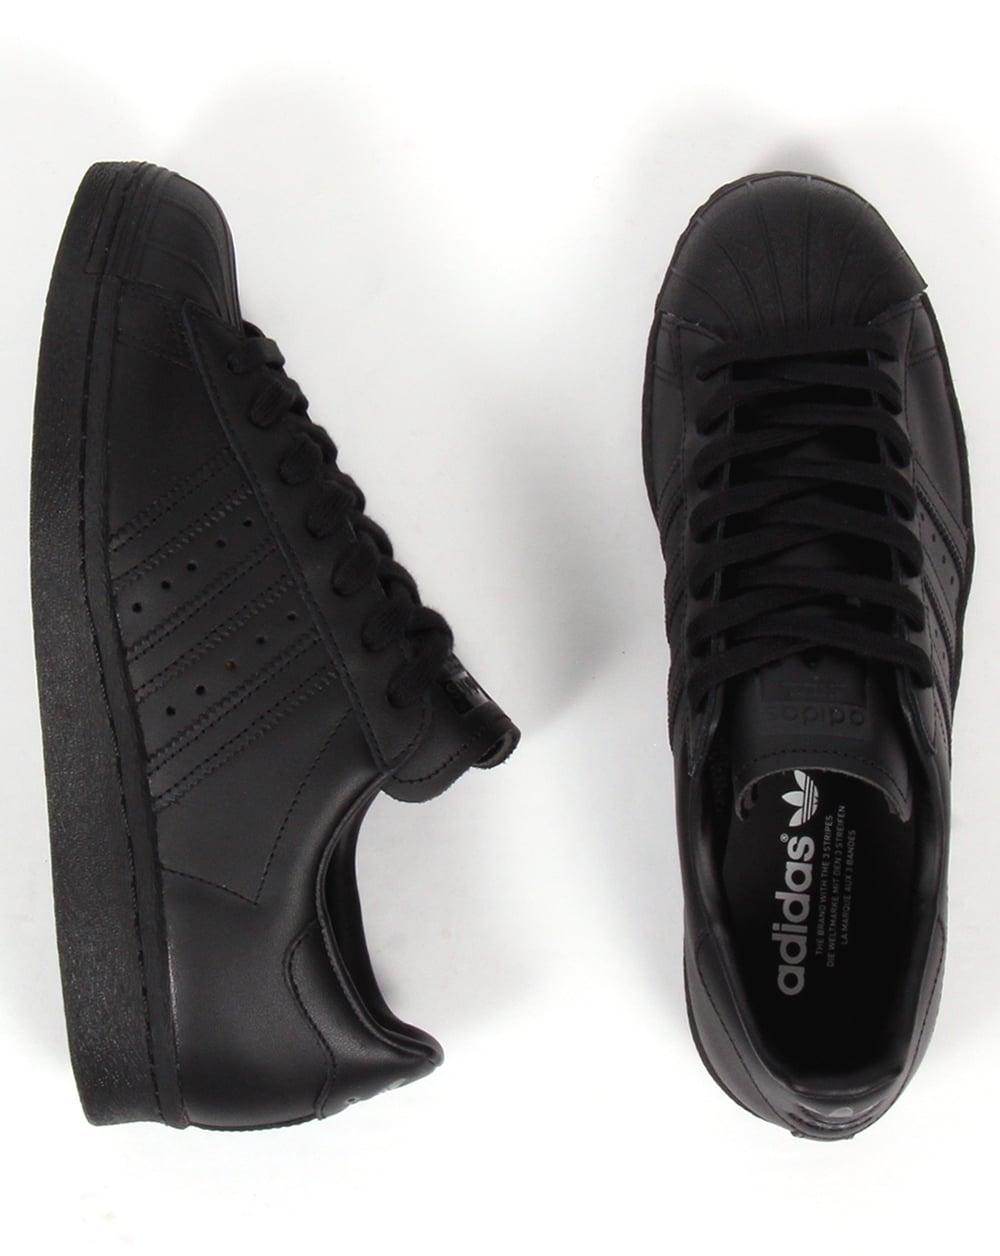 best website d39dc 4b6e3 Adidas Superstar 80s Trainers Black/black